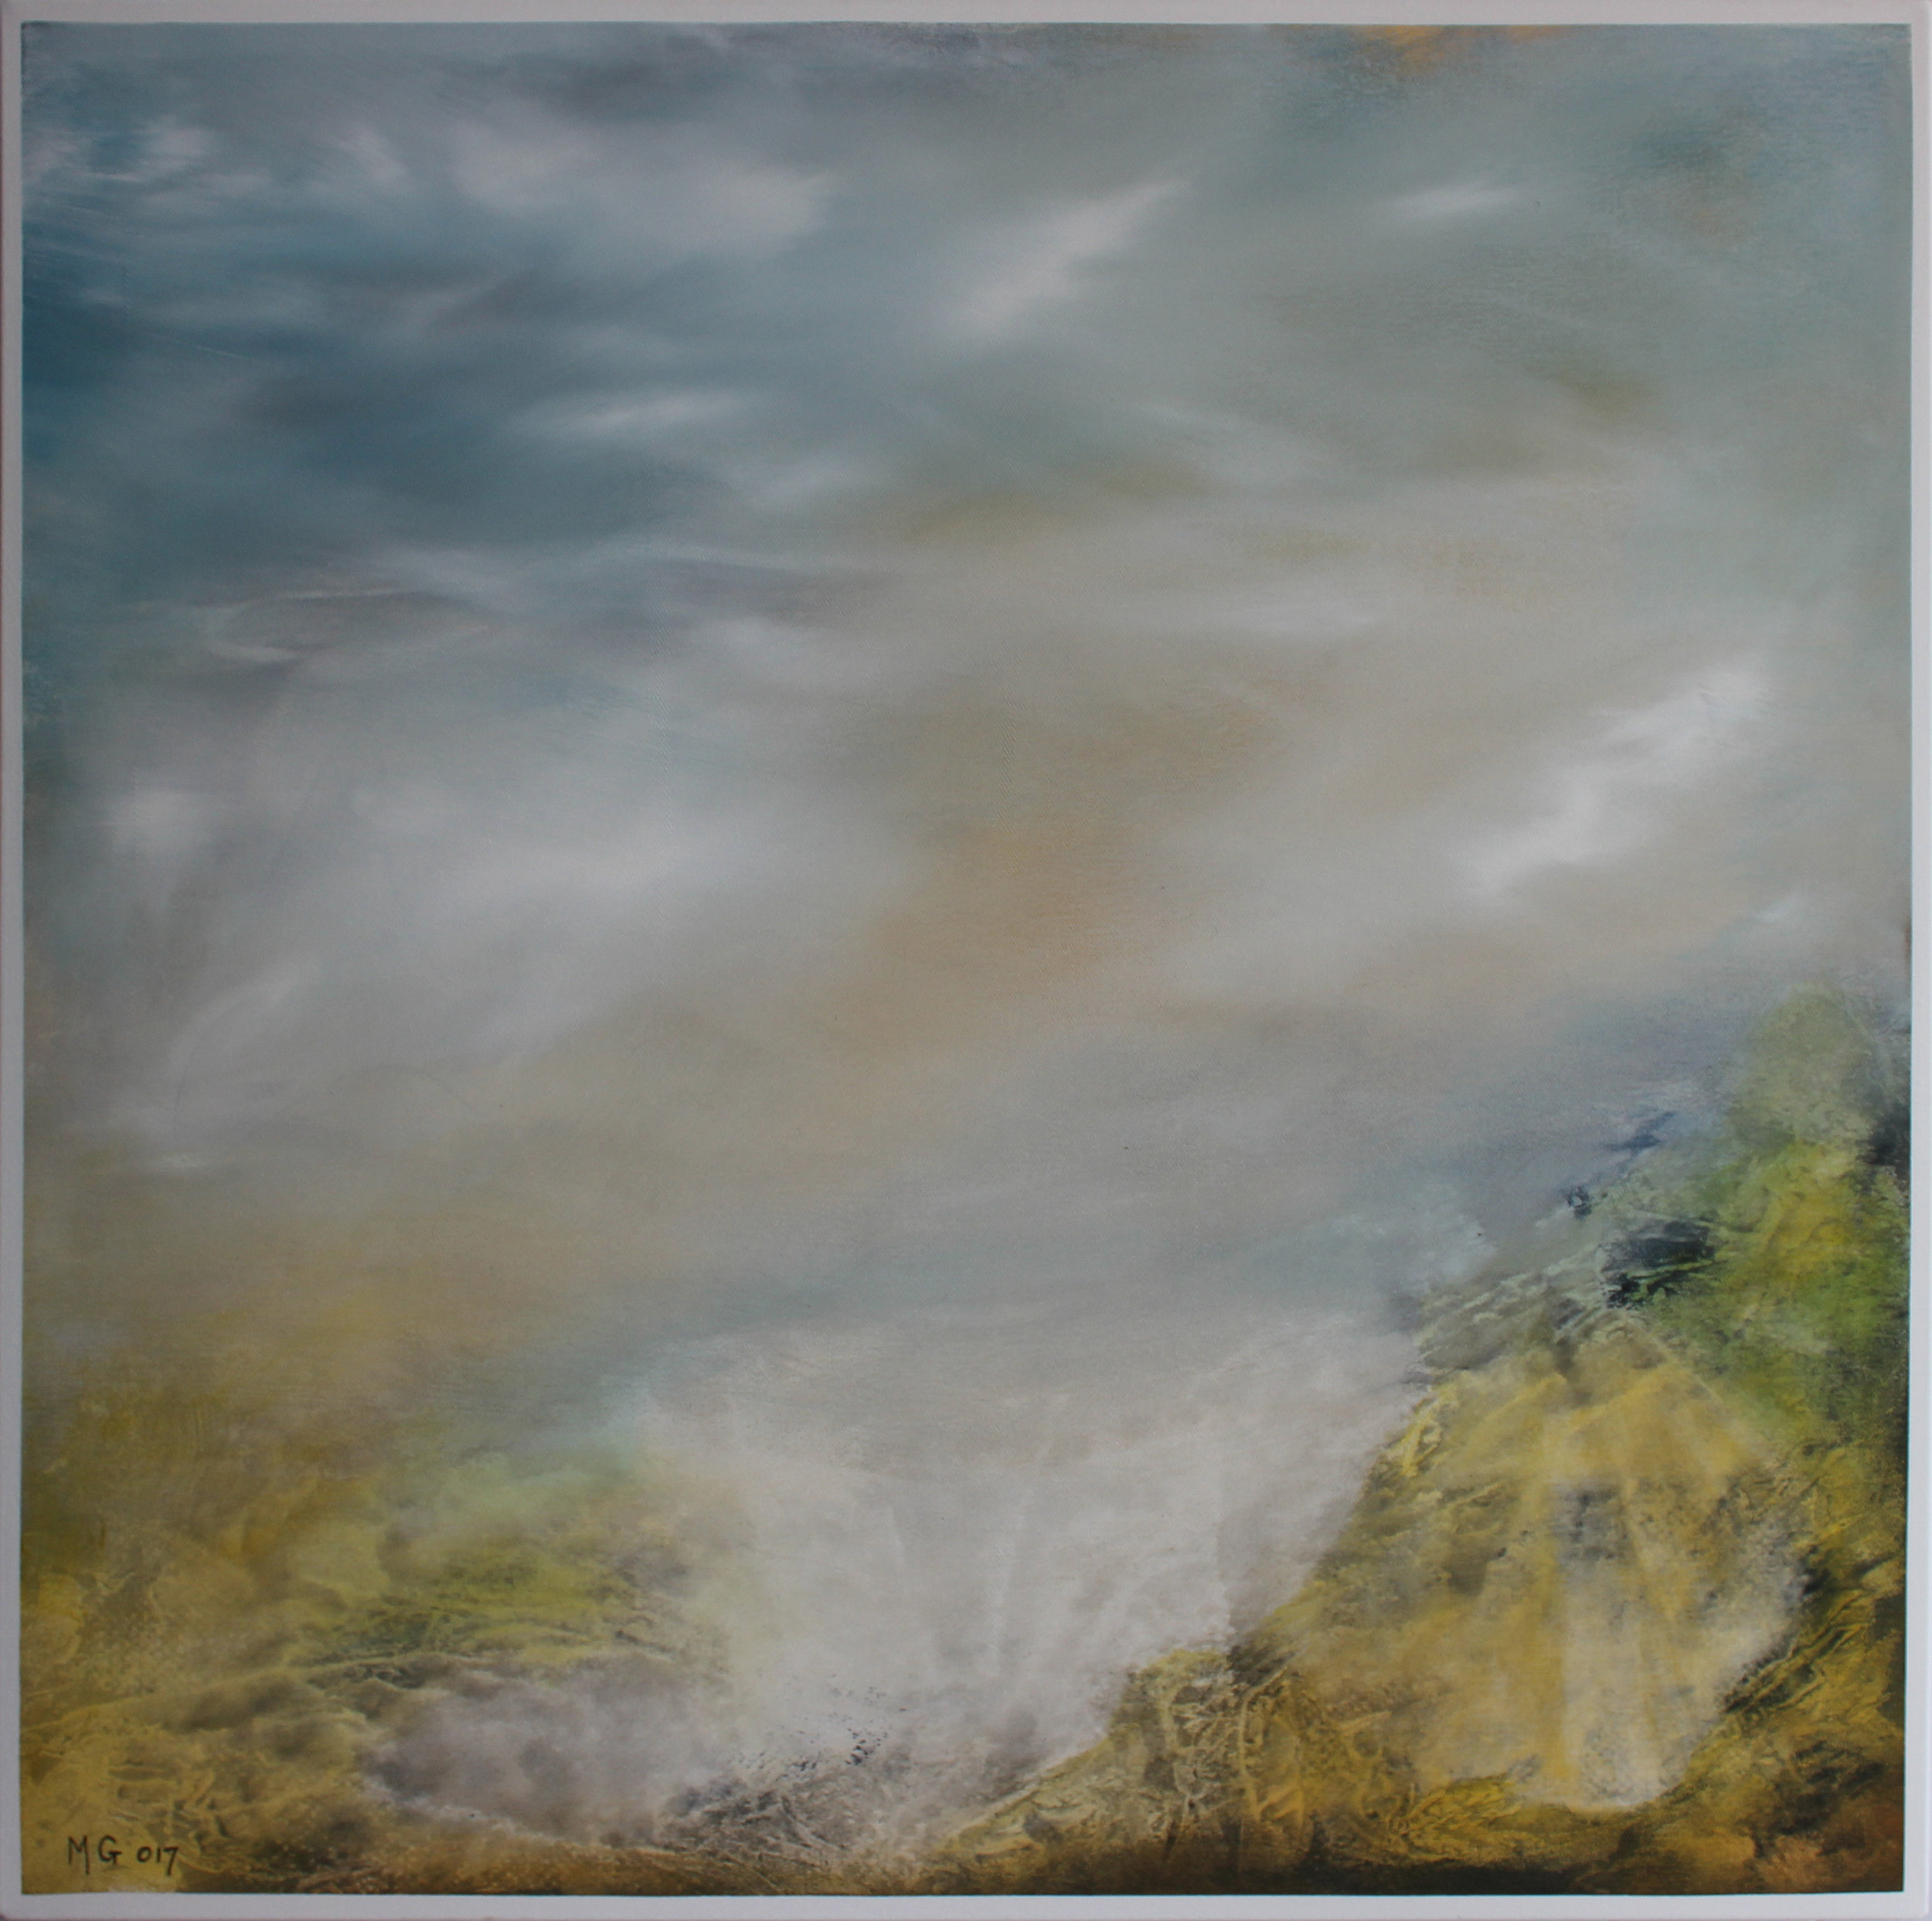 10. GALLAGHER_Martin_On the Road to Shangrila_Acrylic on Canvas_91cmx901cm.JPG